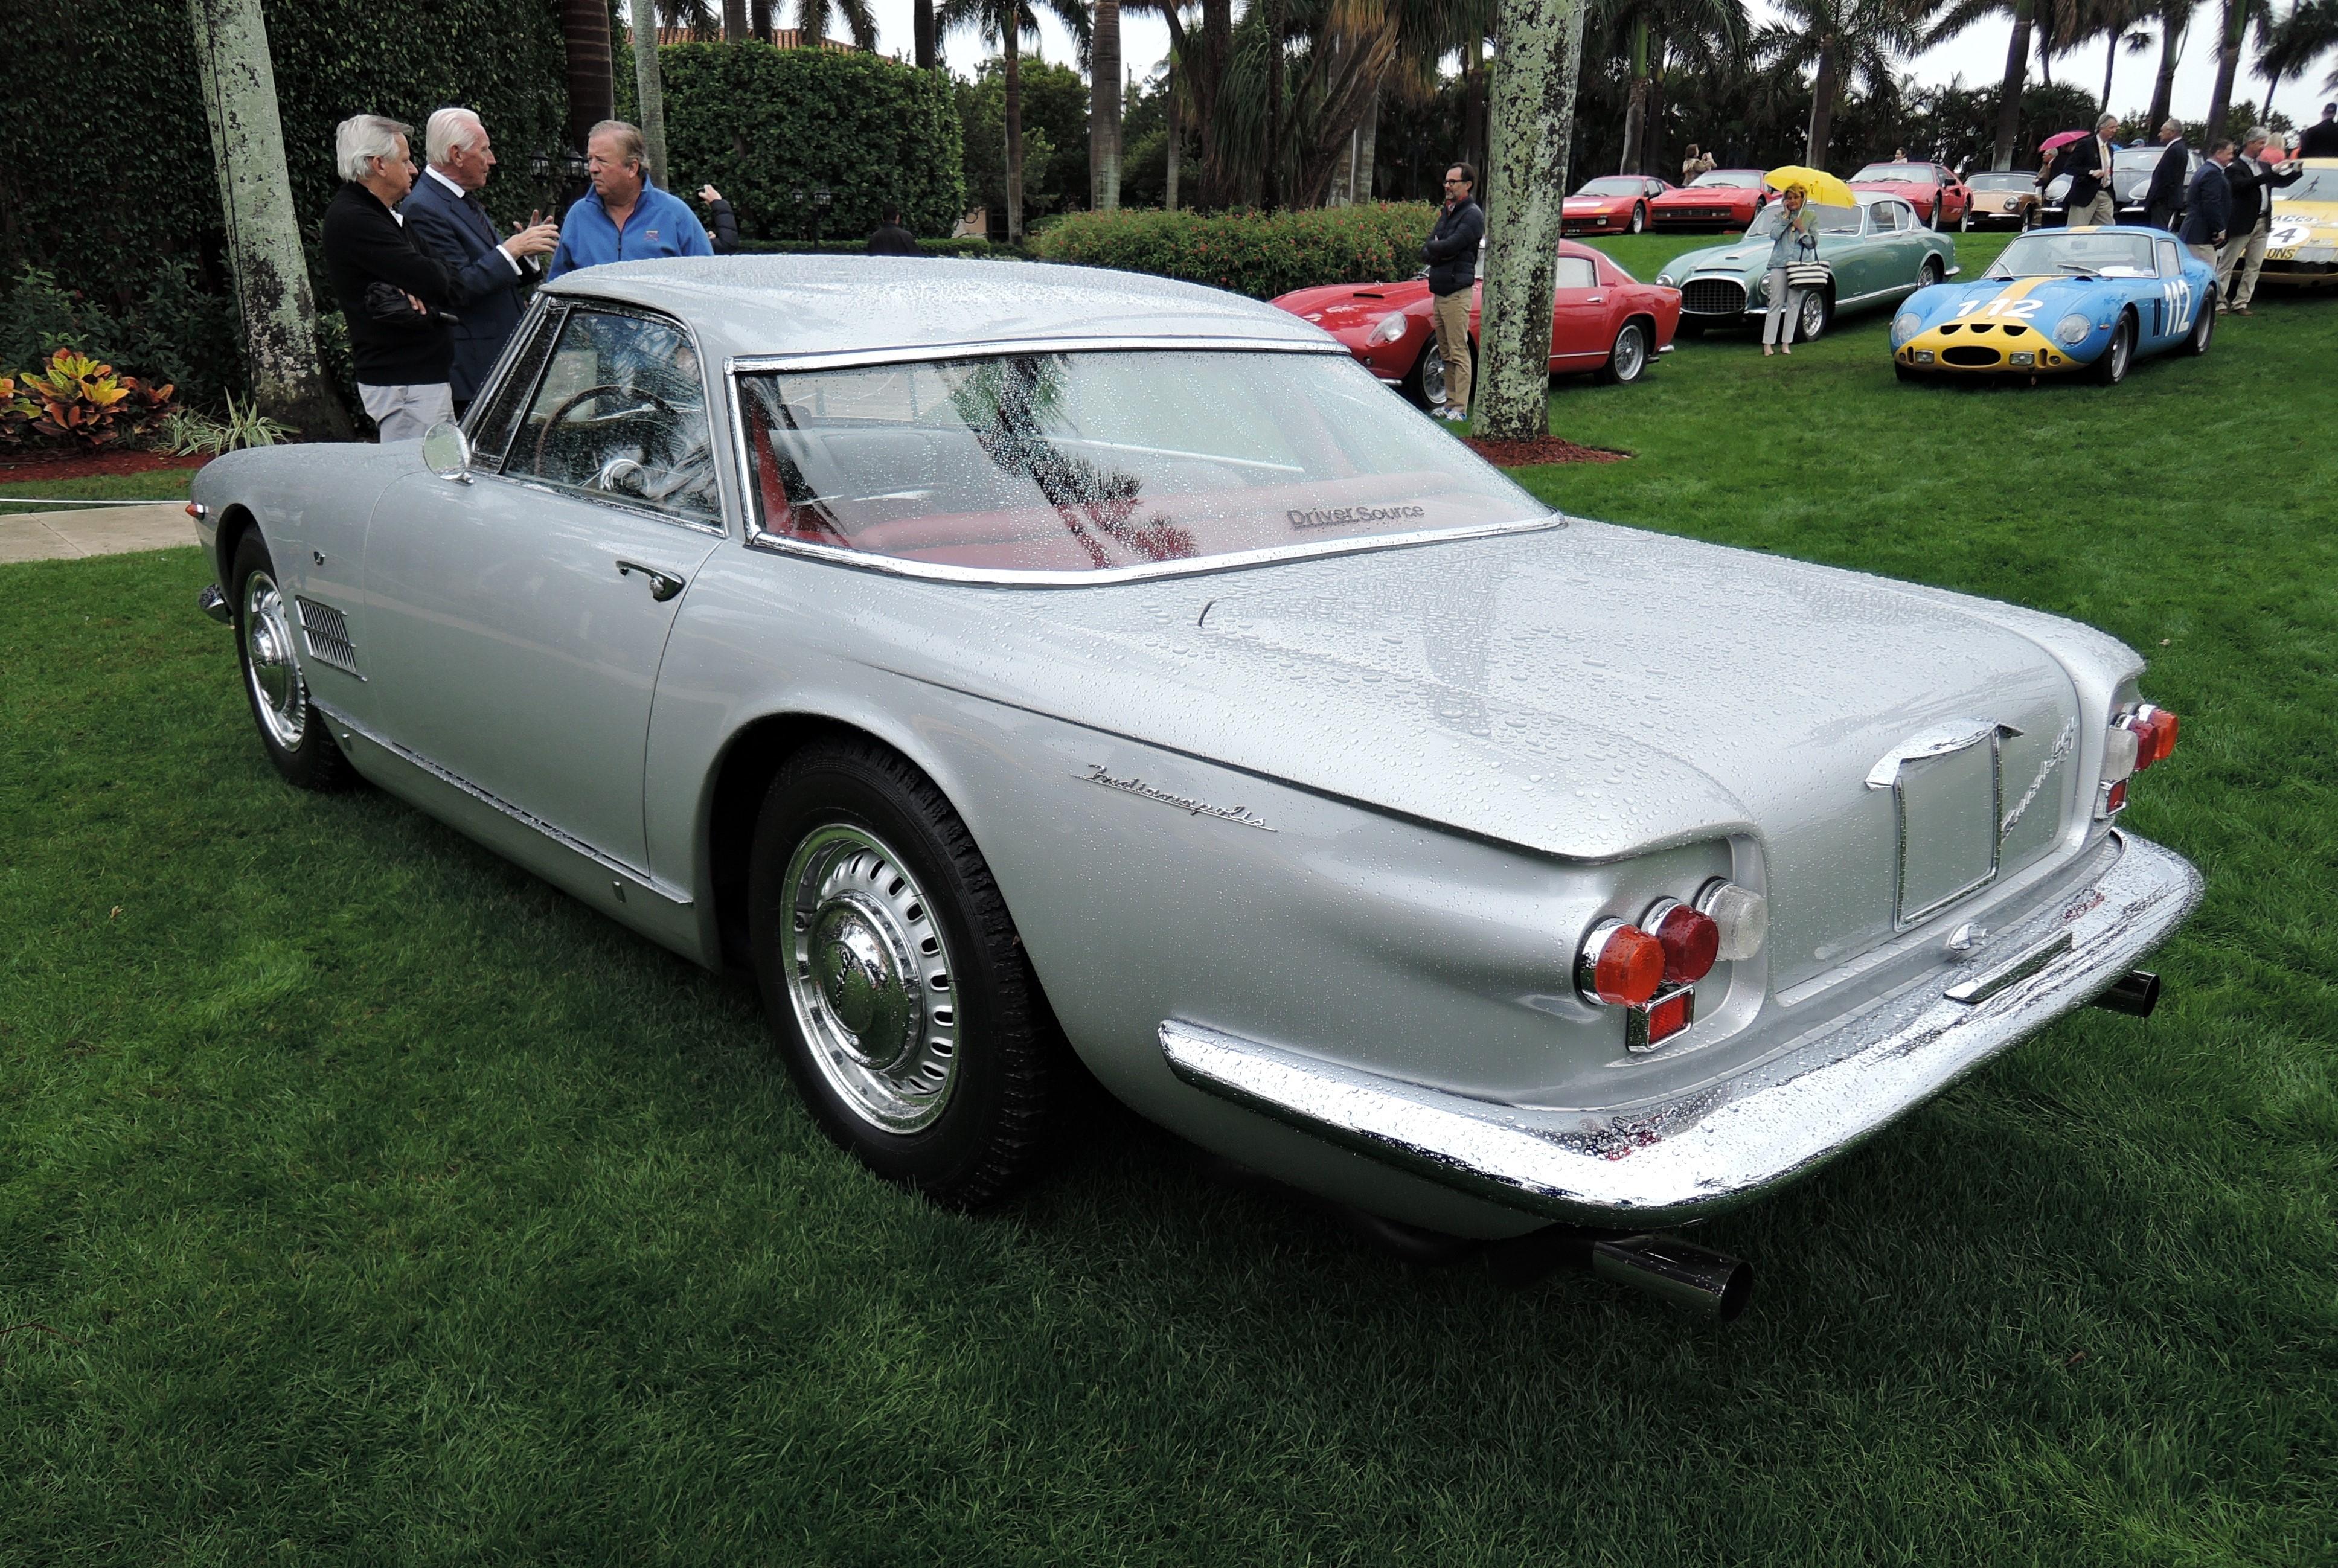 silver 1961 Maserati 500 GT Indy; Sn AM103.014 - MaraLago 2017